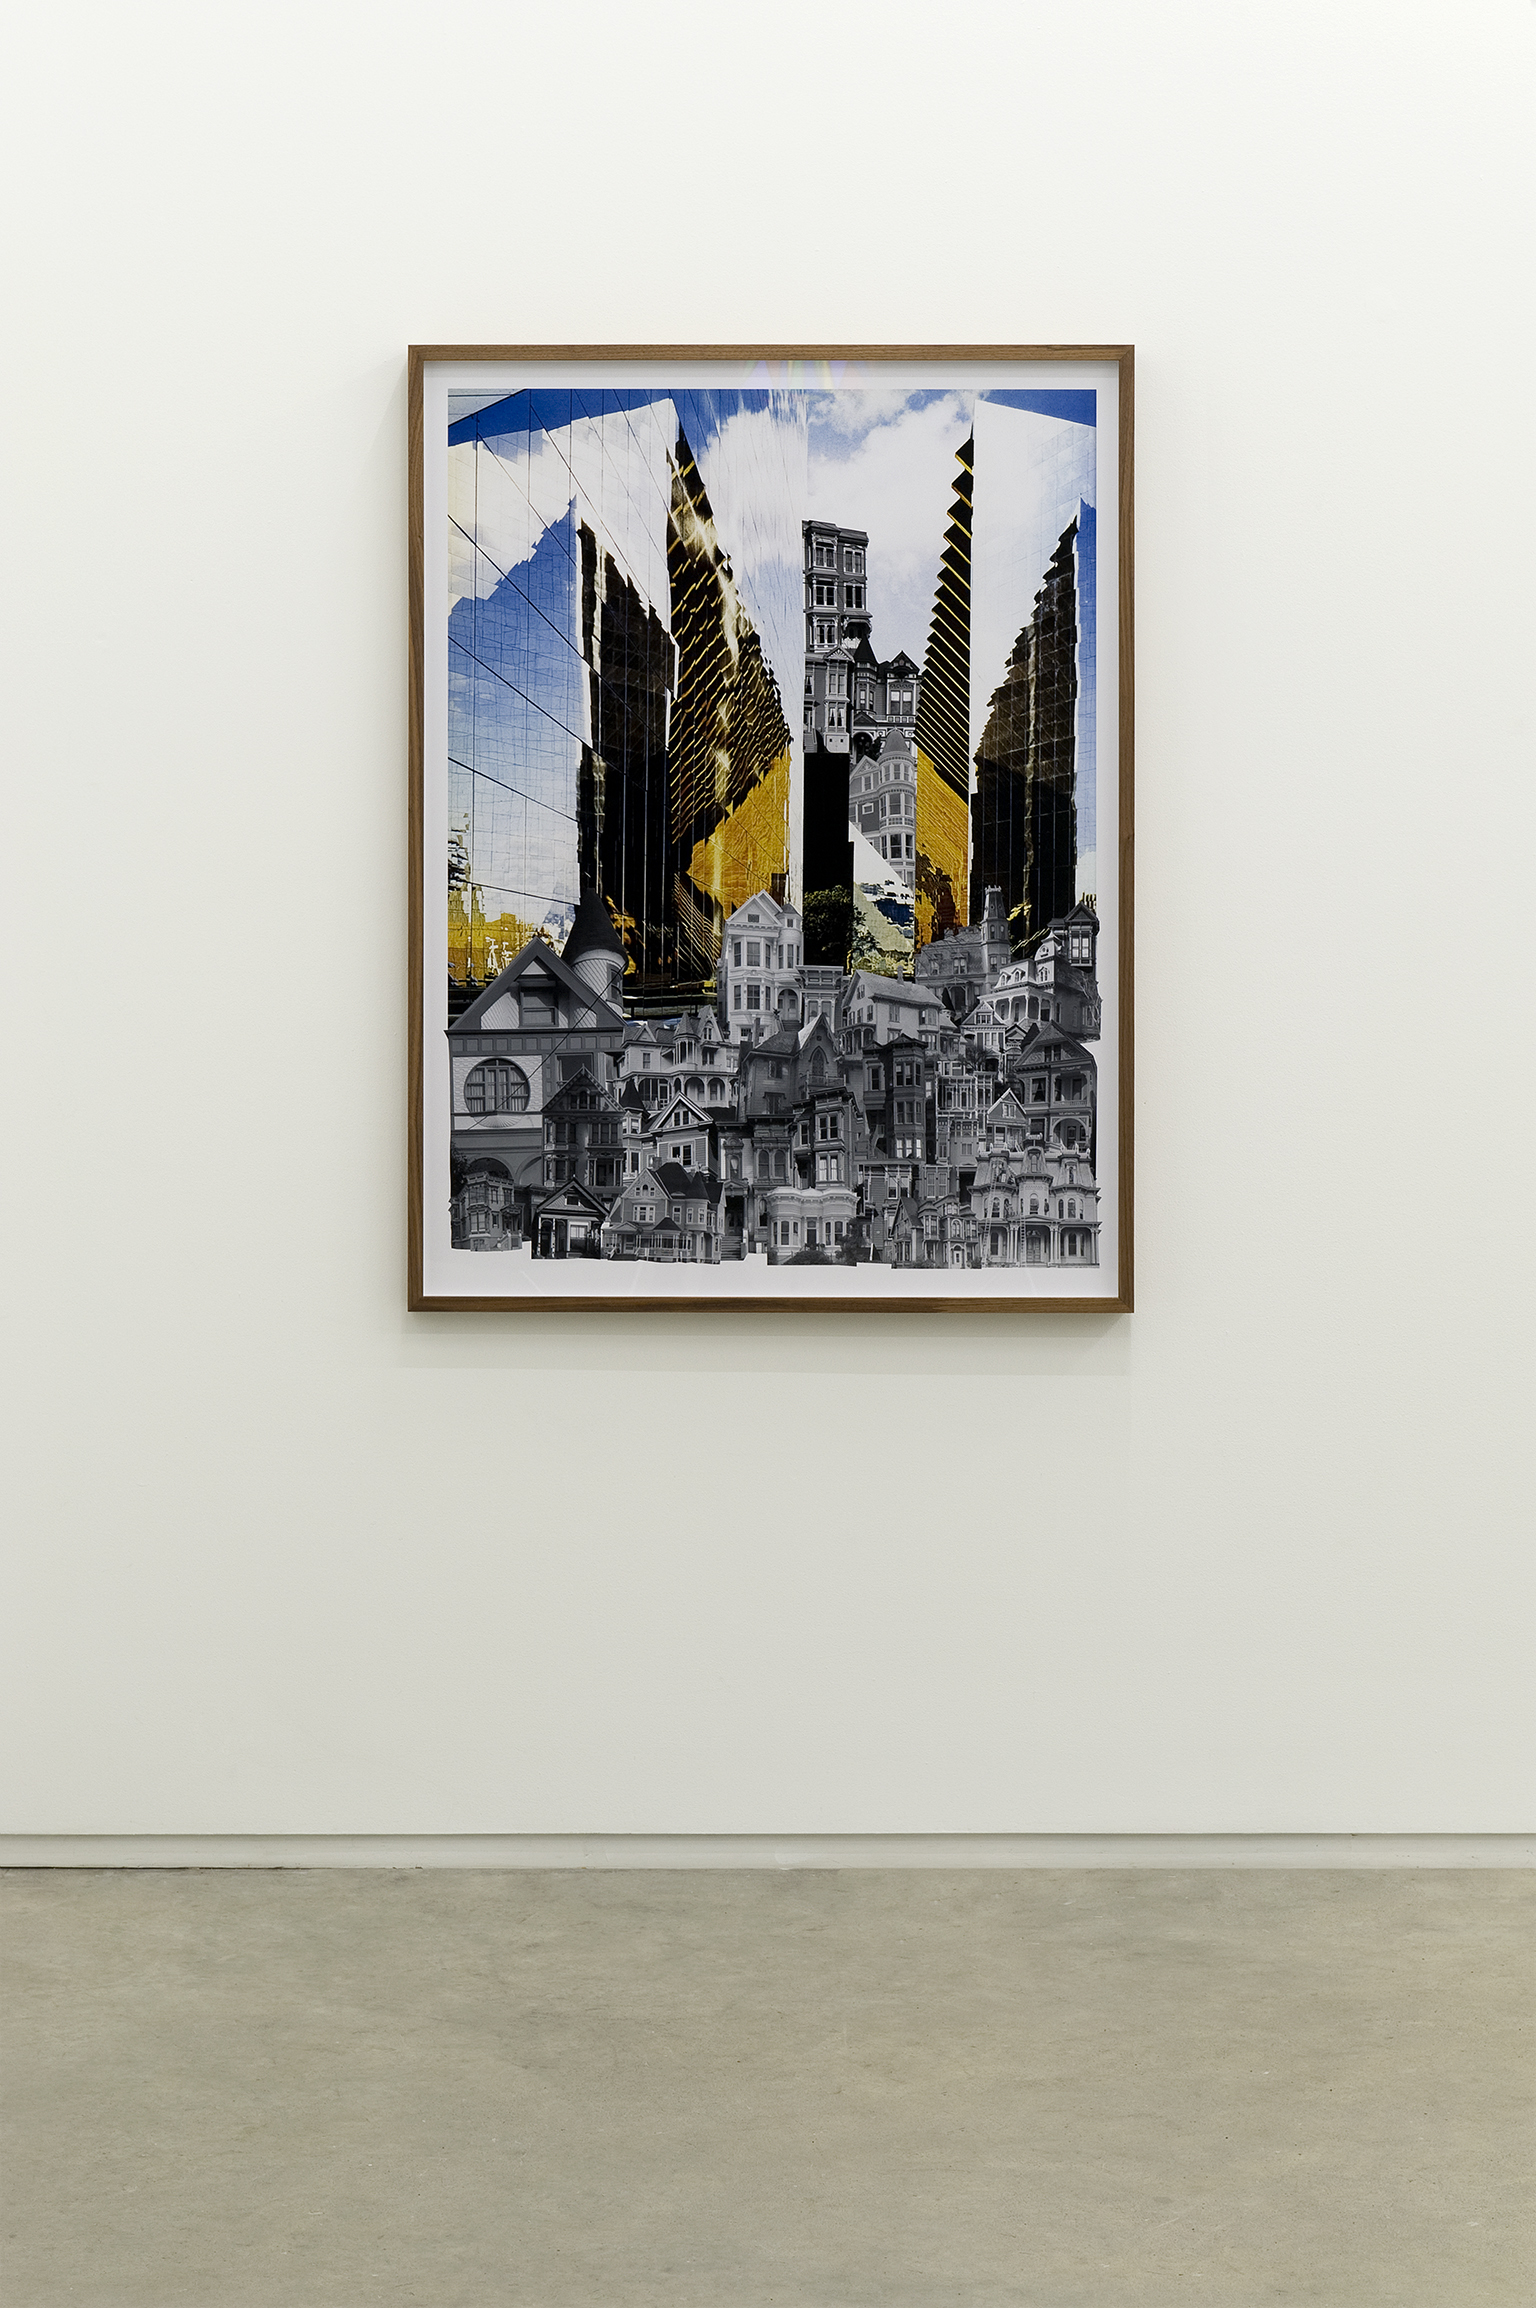 Alex Morrison, Utopia or Oblivion, 2010, colour photo inkjet, 50 x 38 in. (127 x 97 cm) by